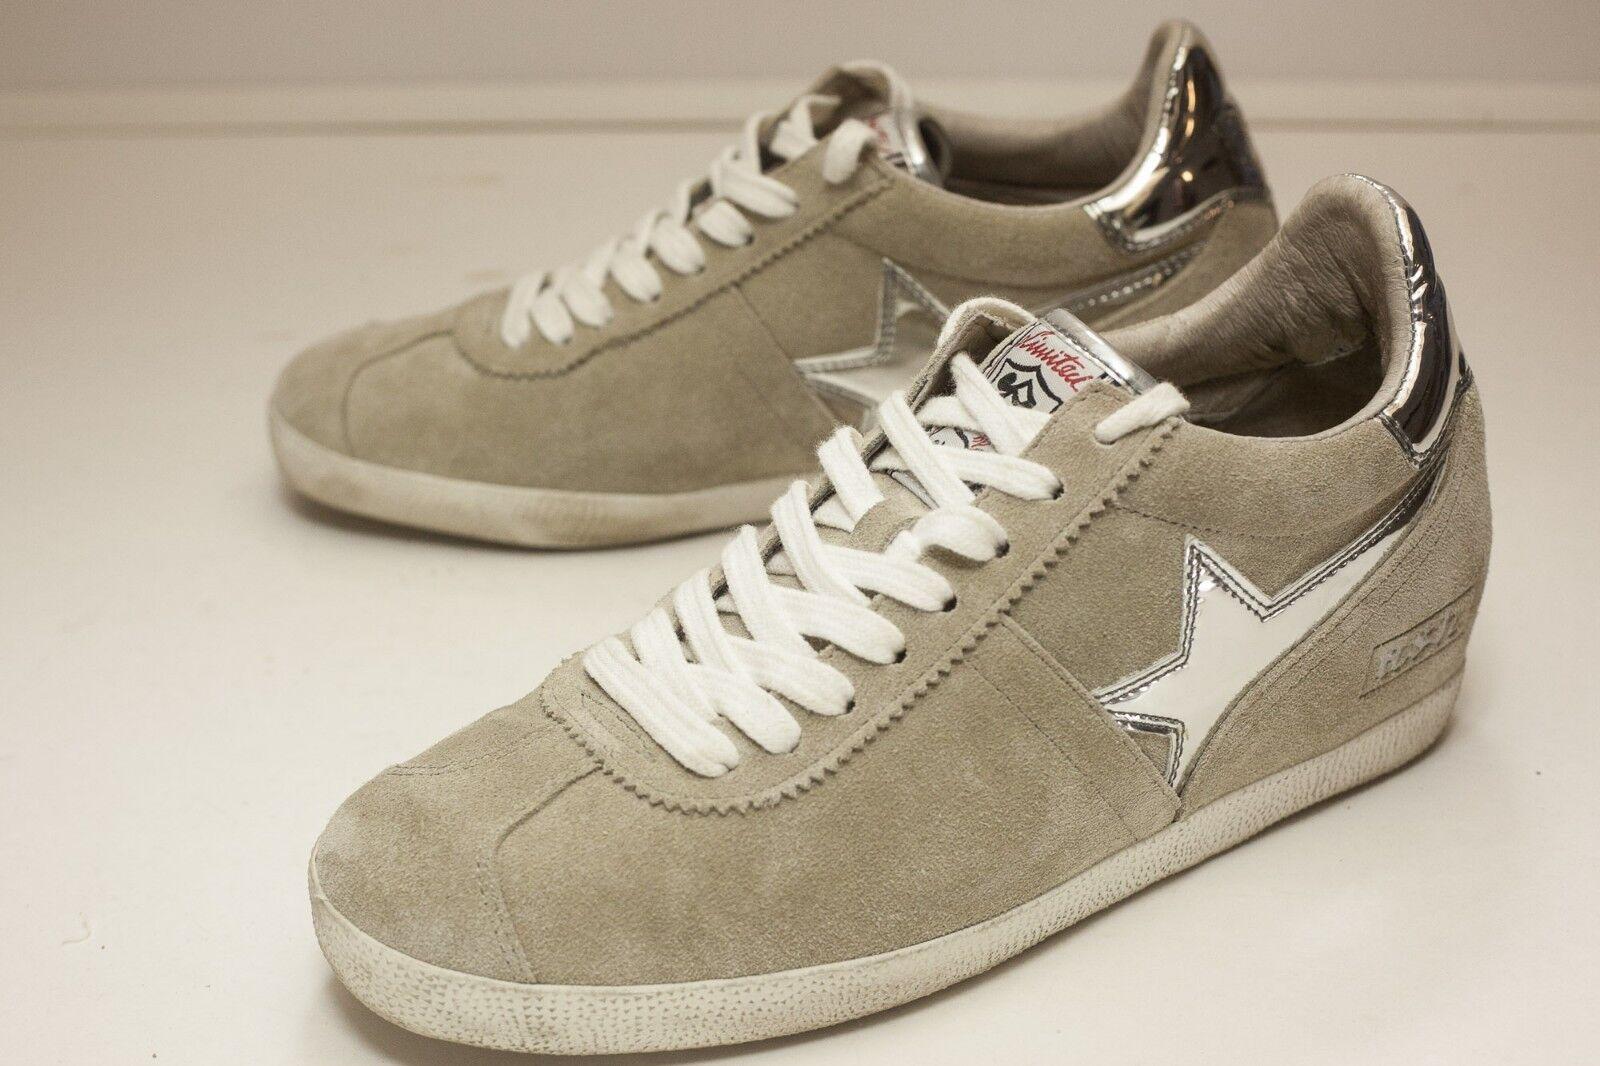 Ash US 8 Tan Silver Lace Up Flat Women's EUR 39